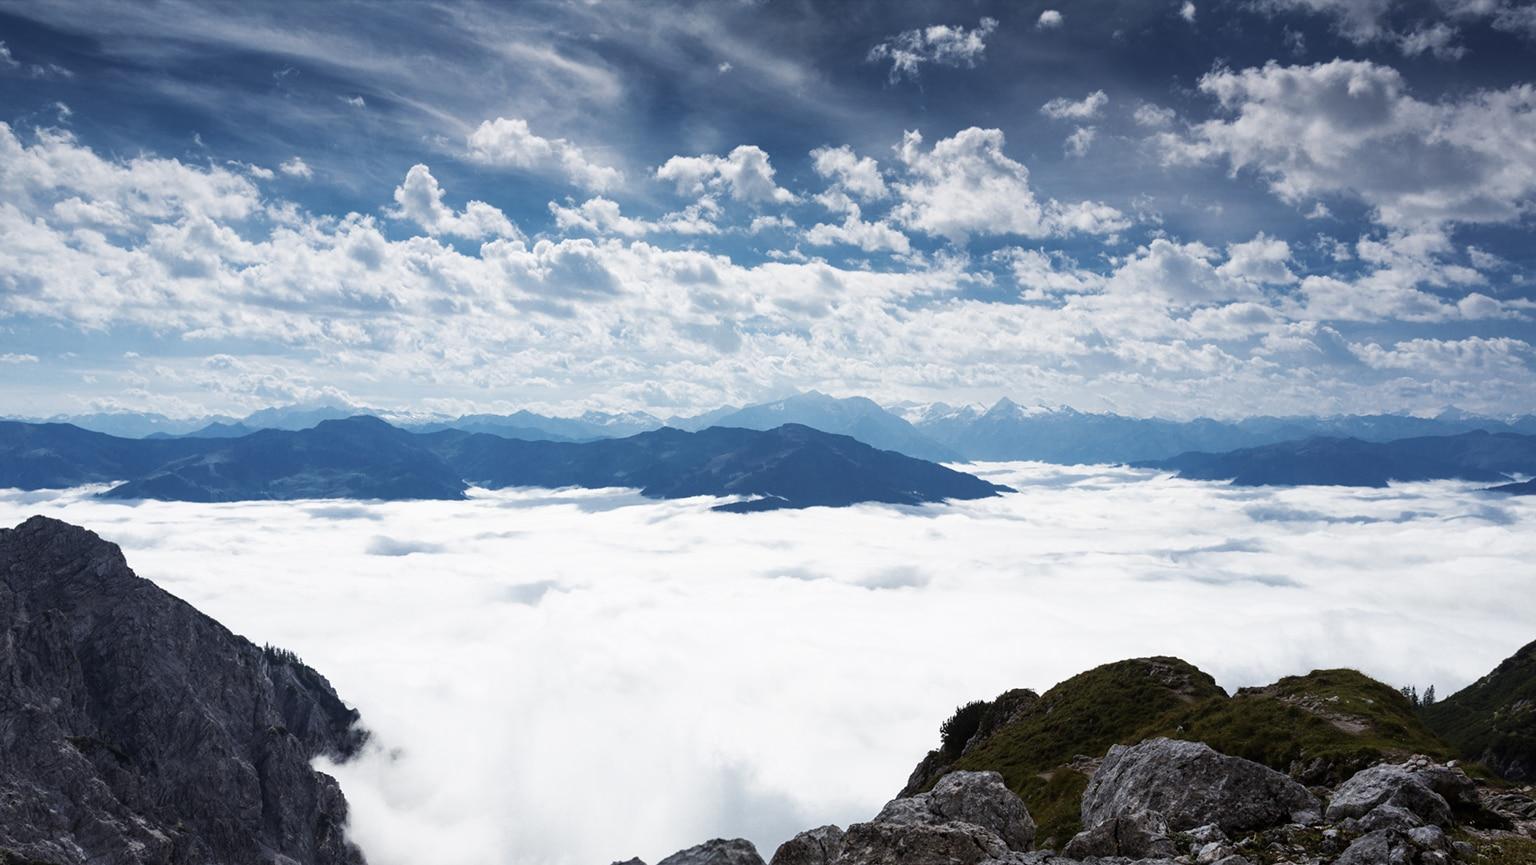 Mountain Influences on the Atmosphere